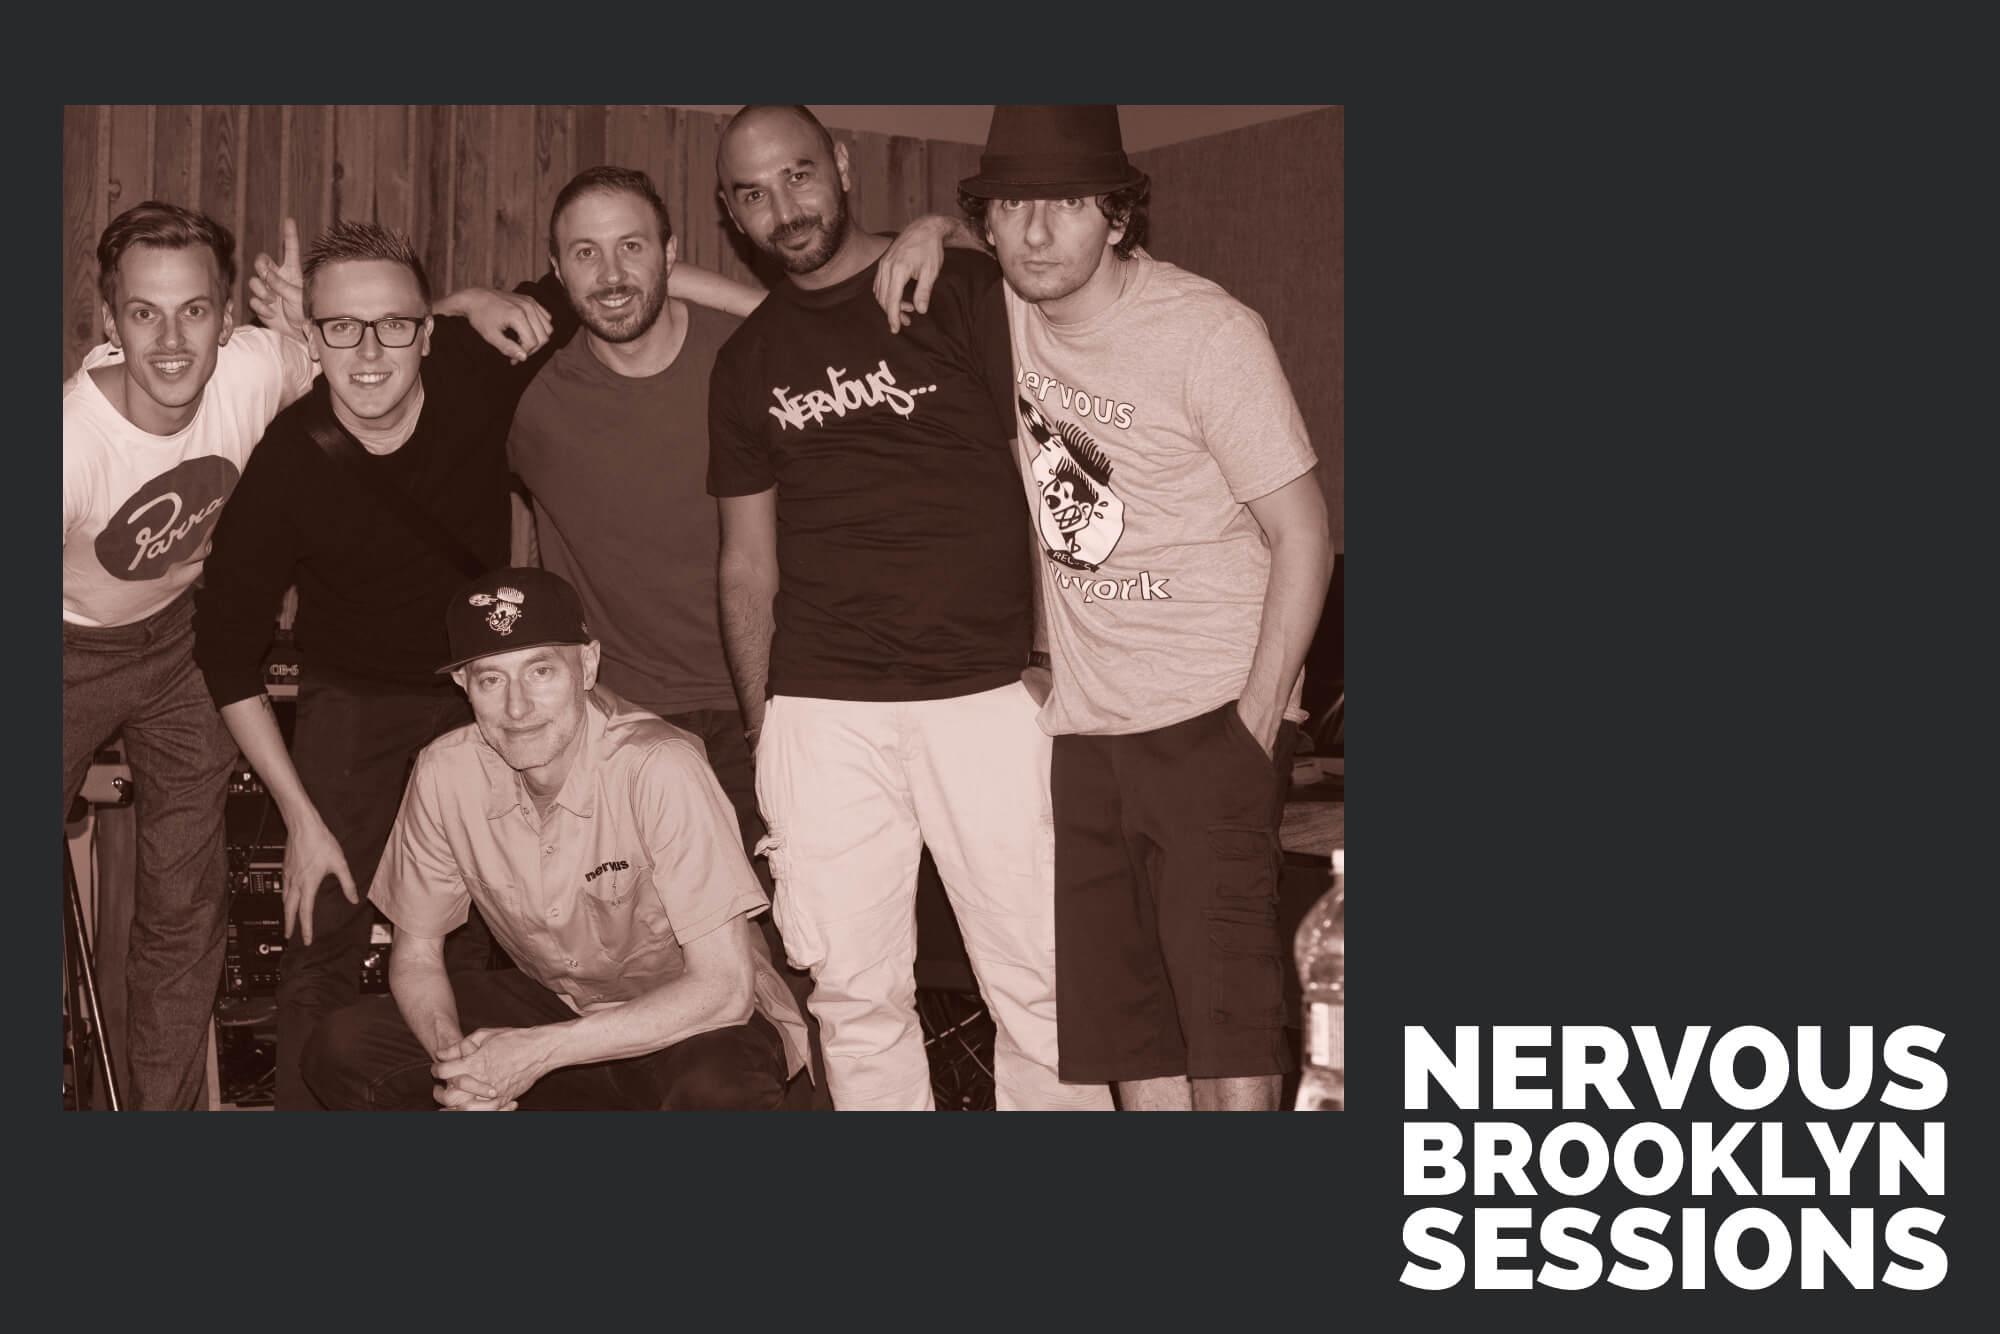 Nervous Brooklyn Sessions